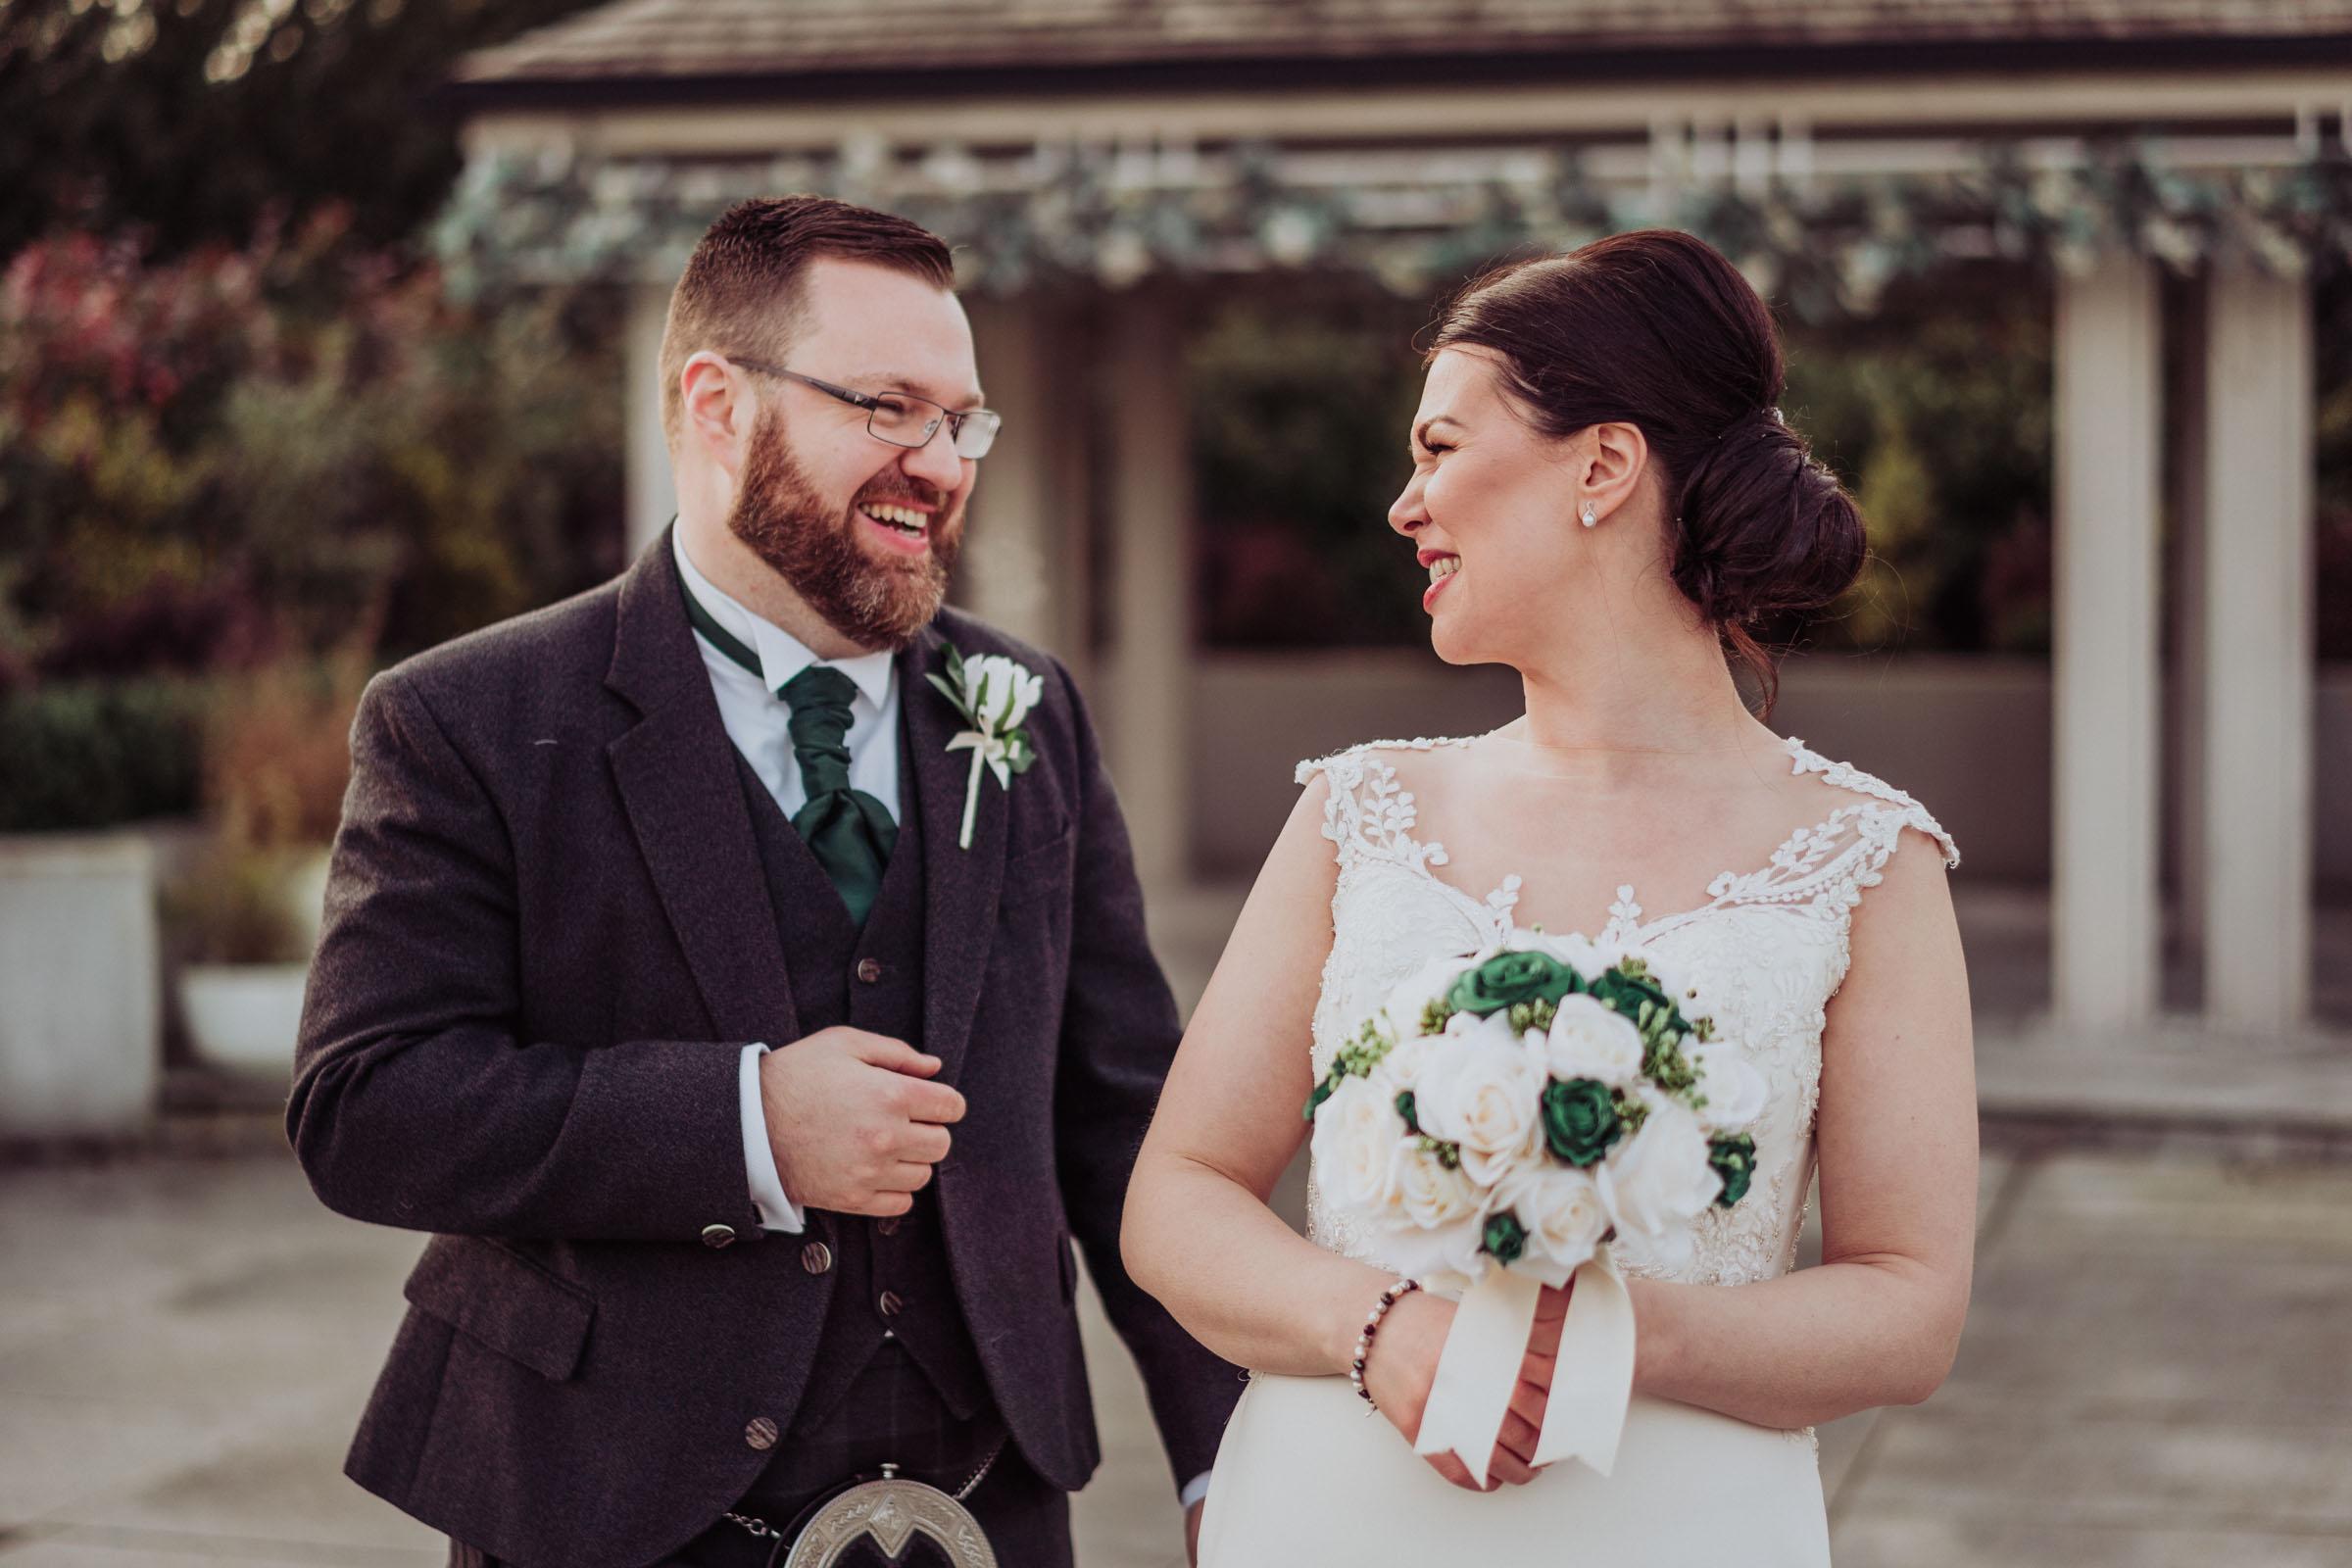 Radstone-Wedding-Dearly-Photography-Scotland (41 of 50).jpg